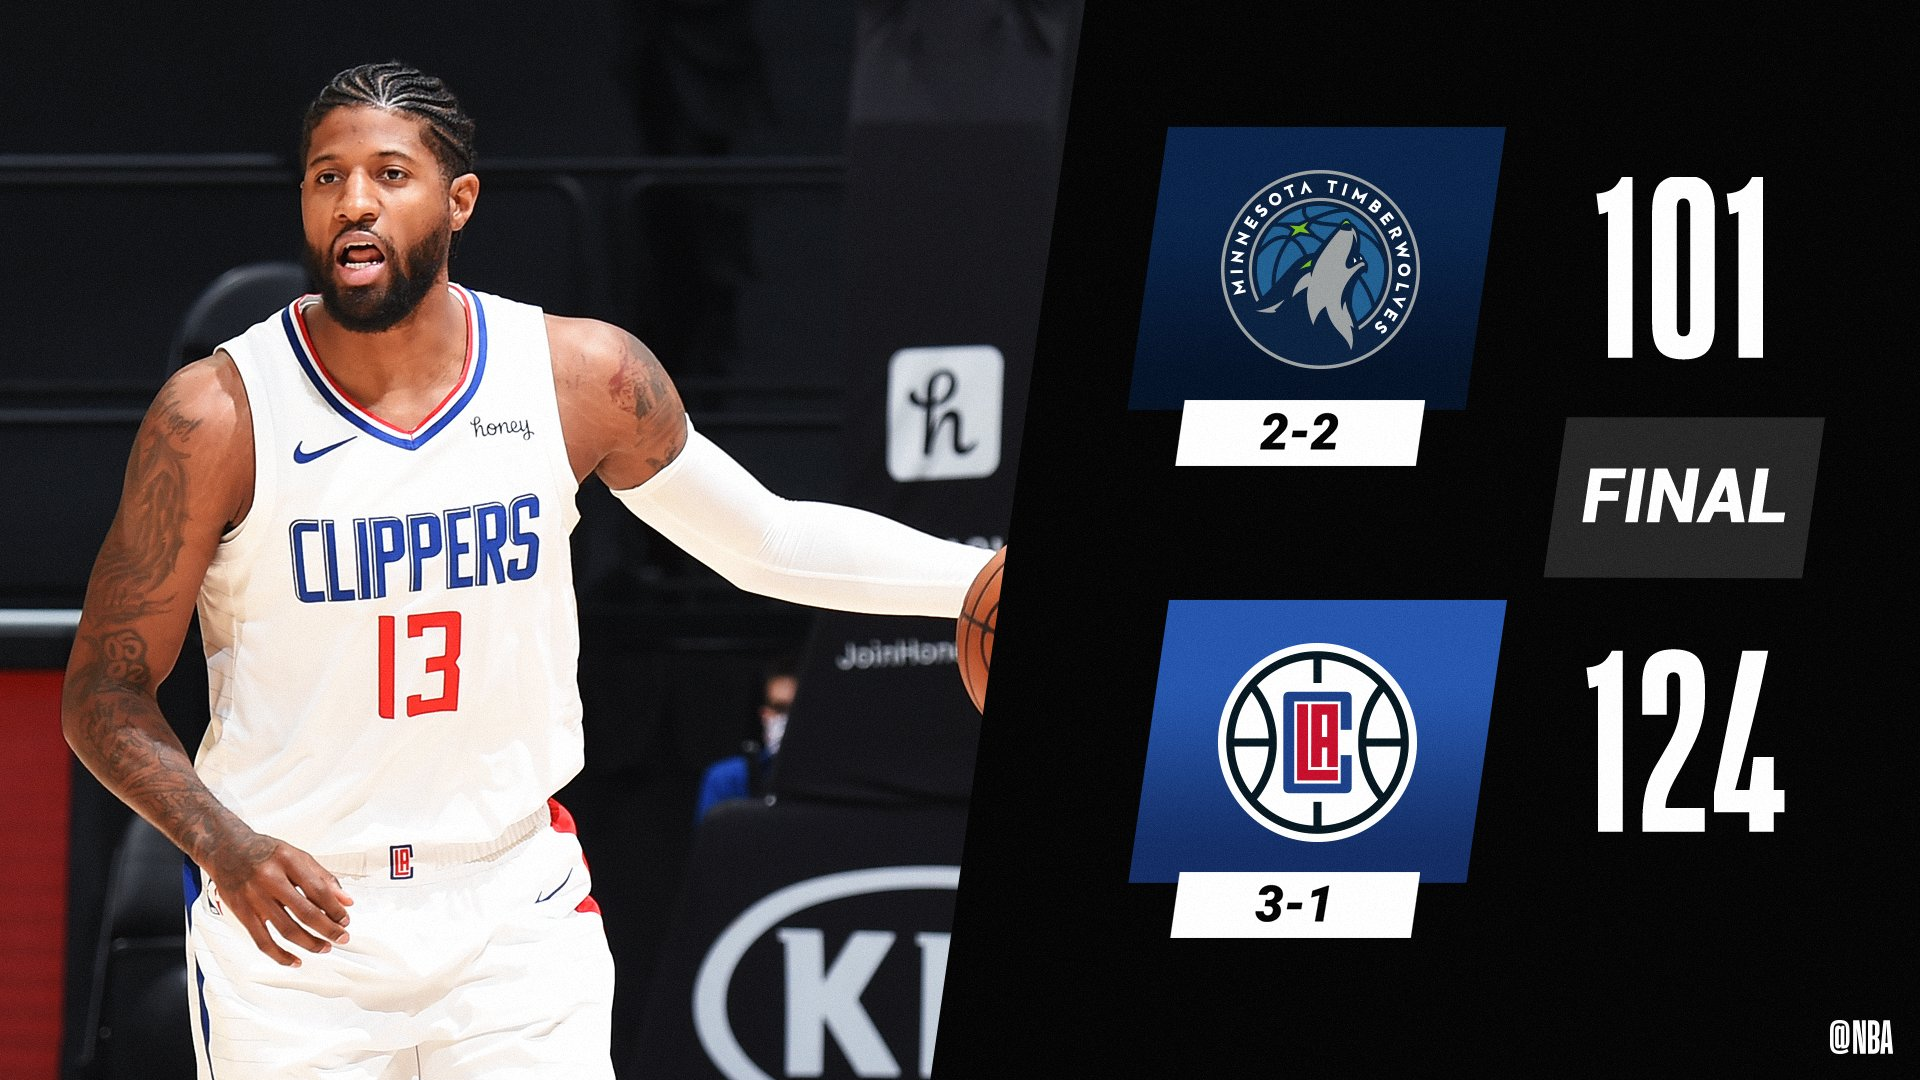 30-12-1